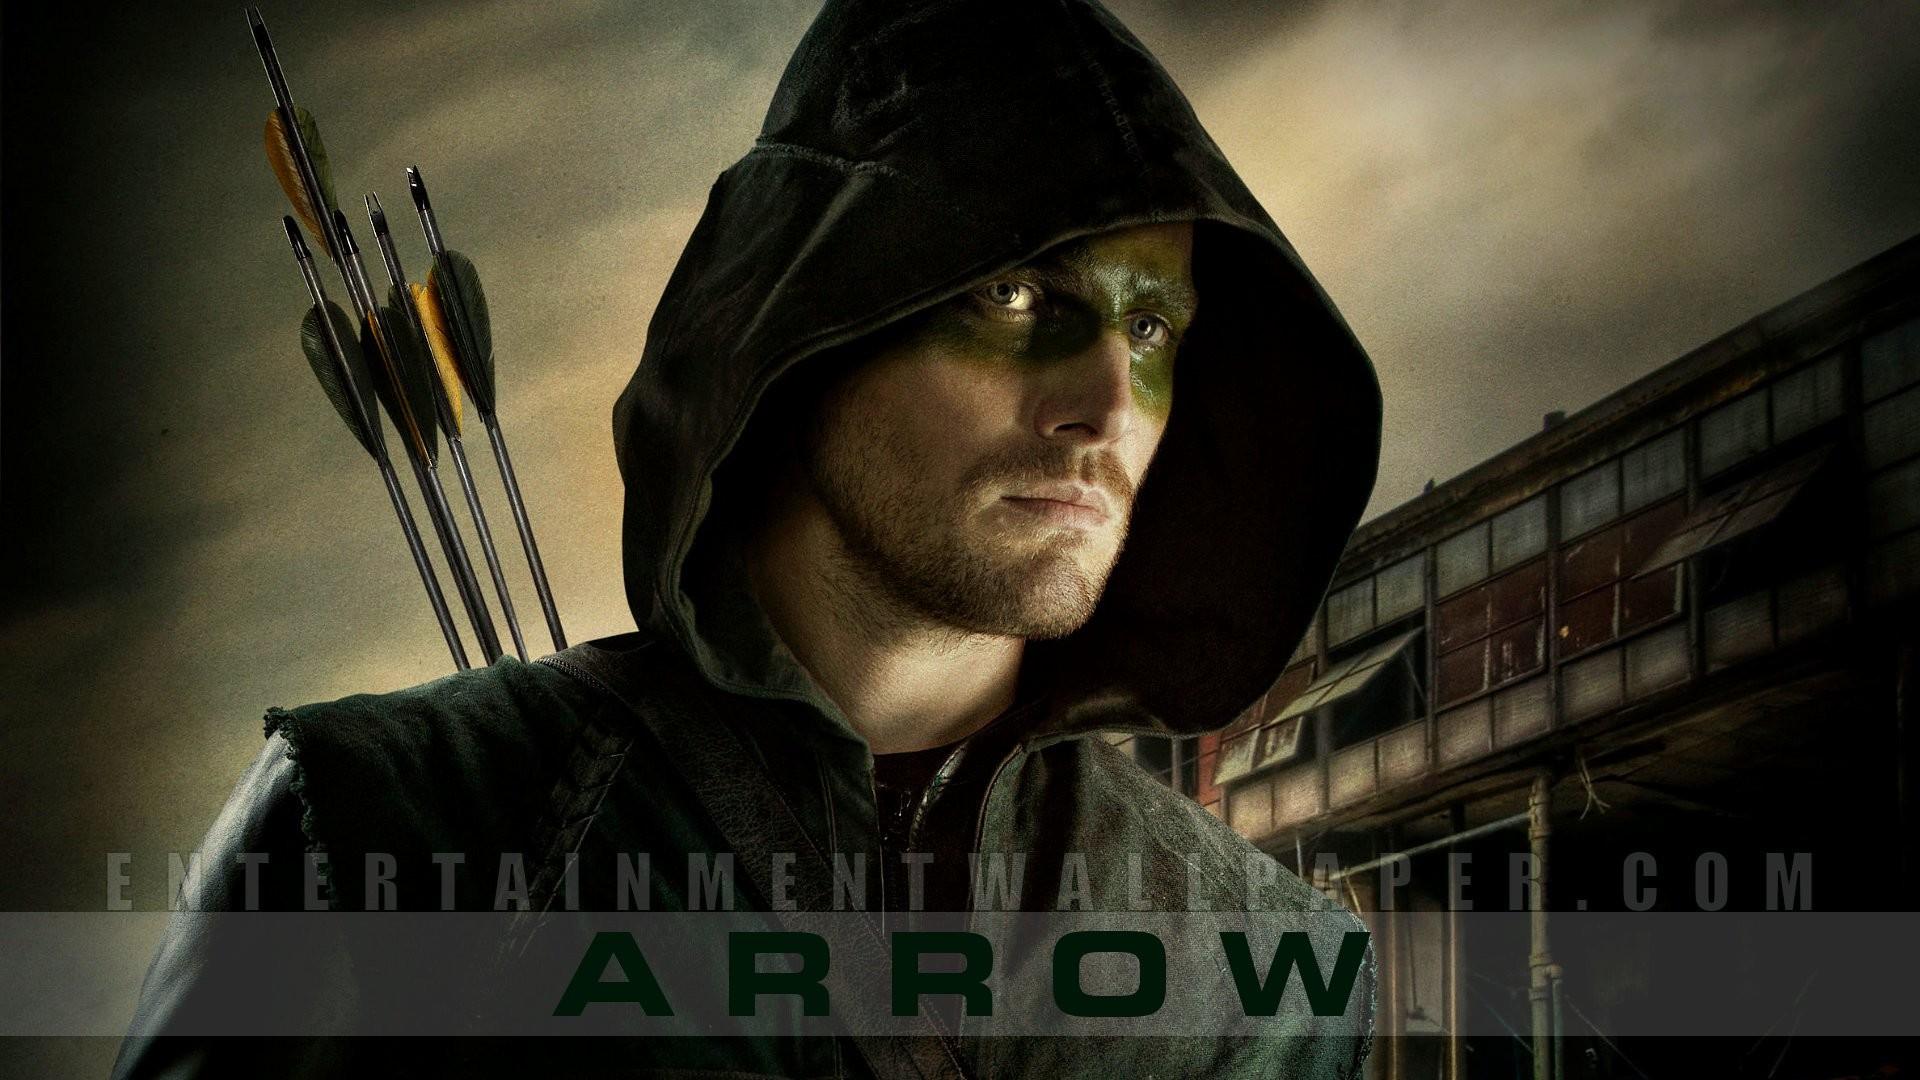 Green Arrow Wallpaper 1024×768 – WallpaperSafari